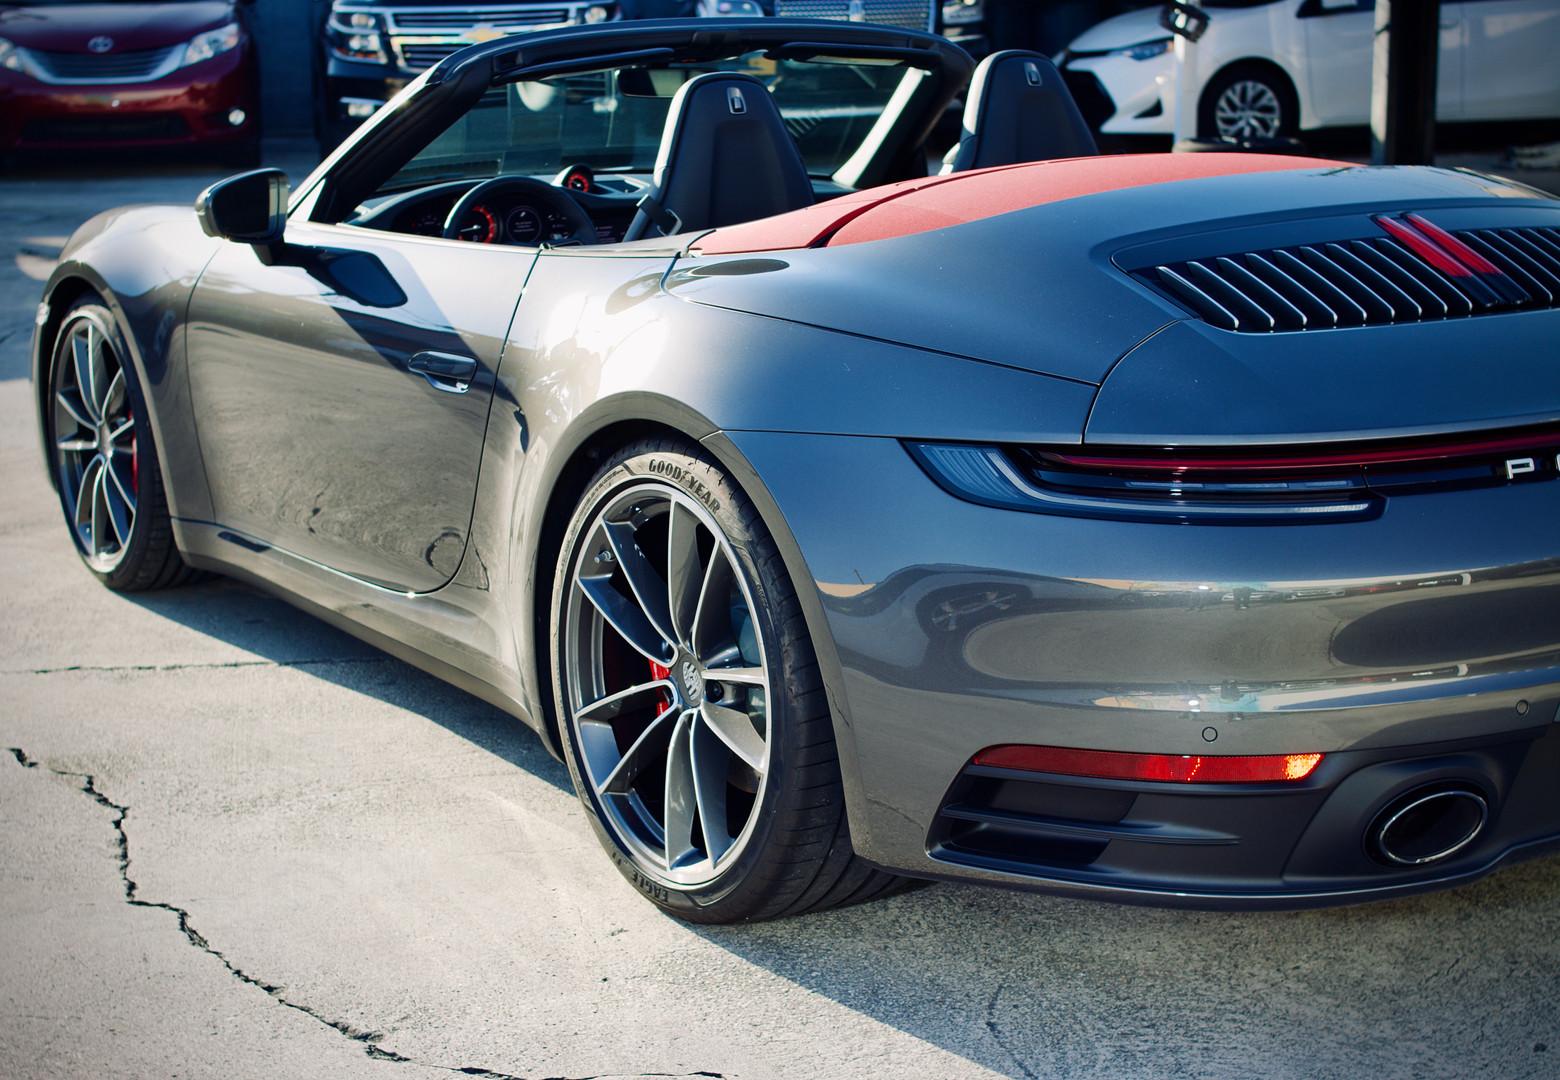 Porsche Carrera 4S rear by Coppola Conci